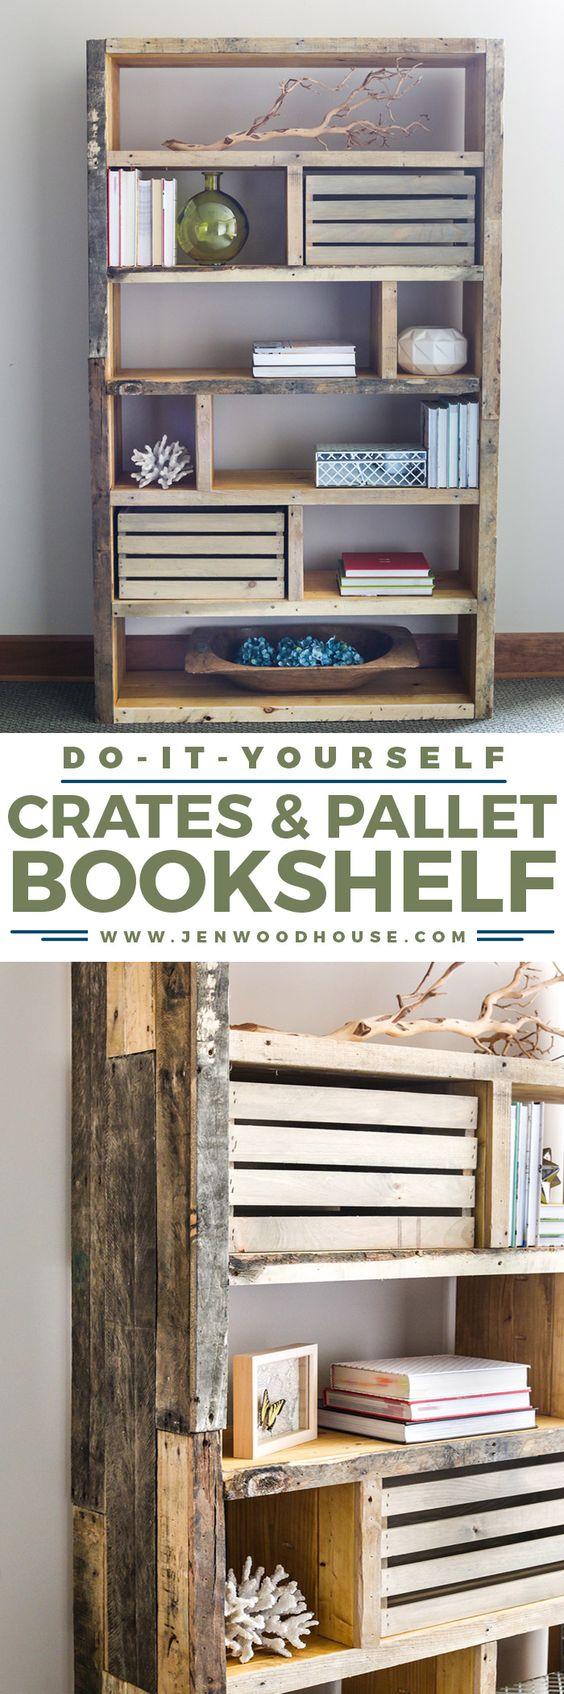 Diy rustic pallet bookshelf beautiful raising and ants for Reclaimed wood bookcase diy